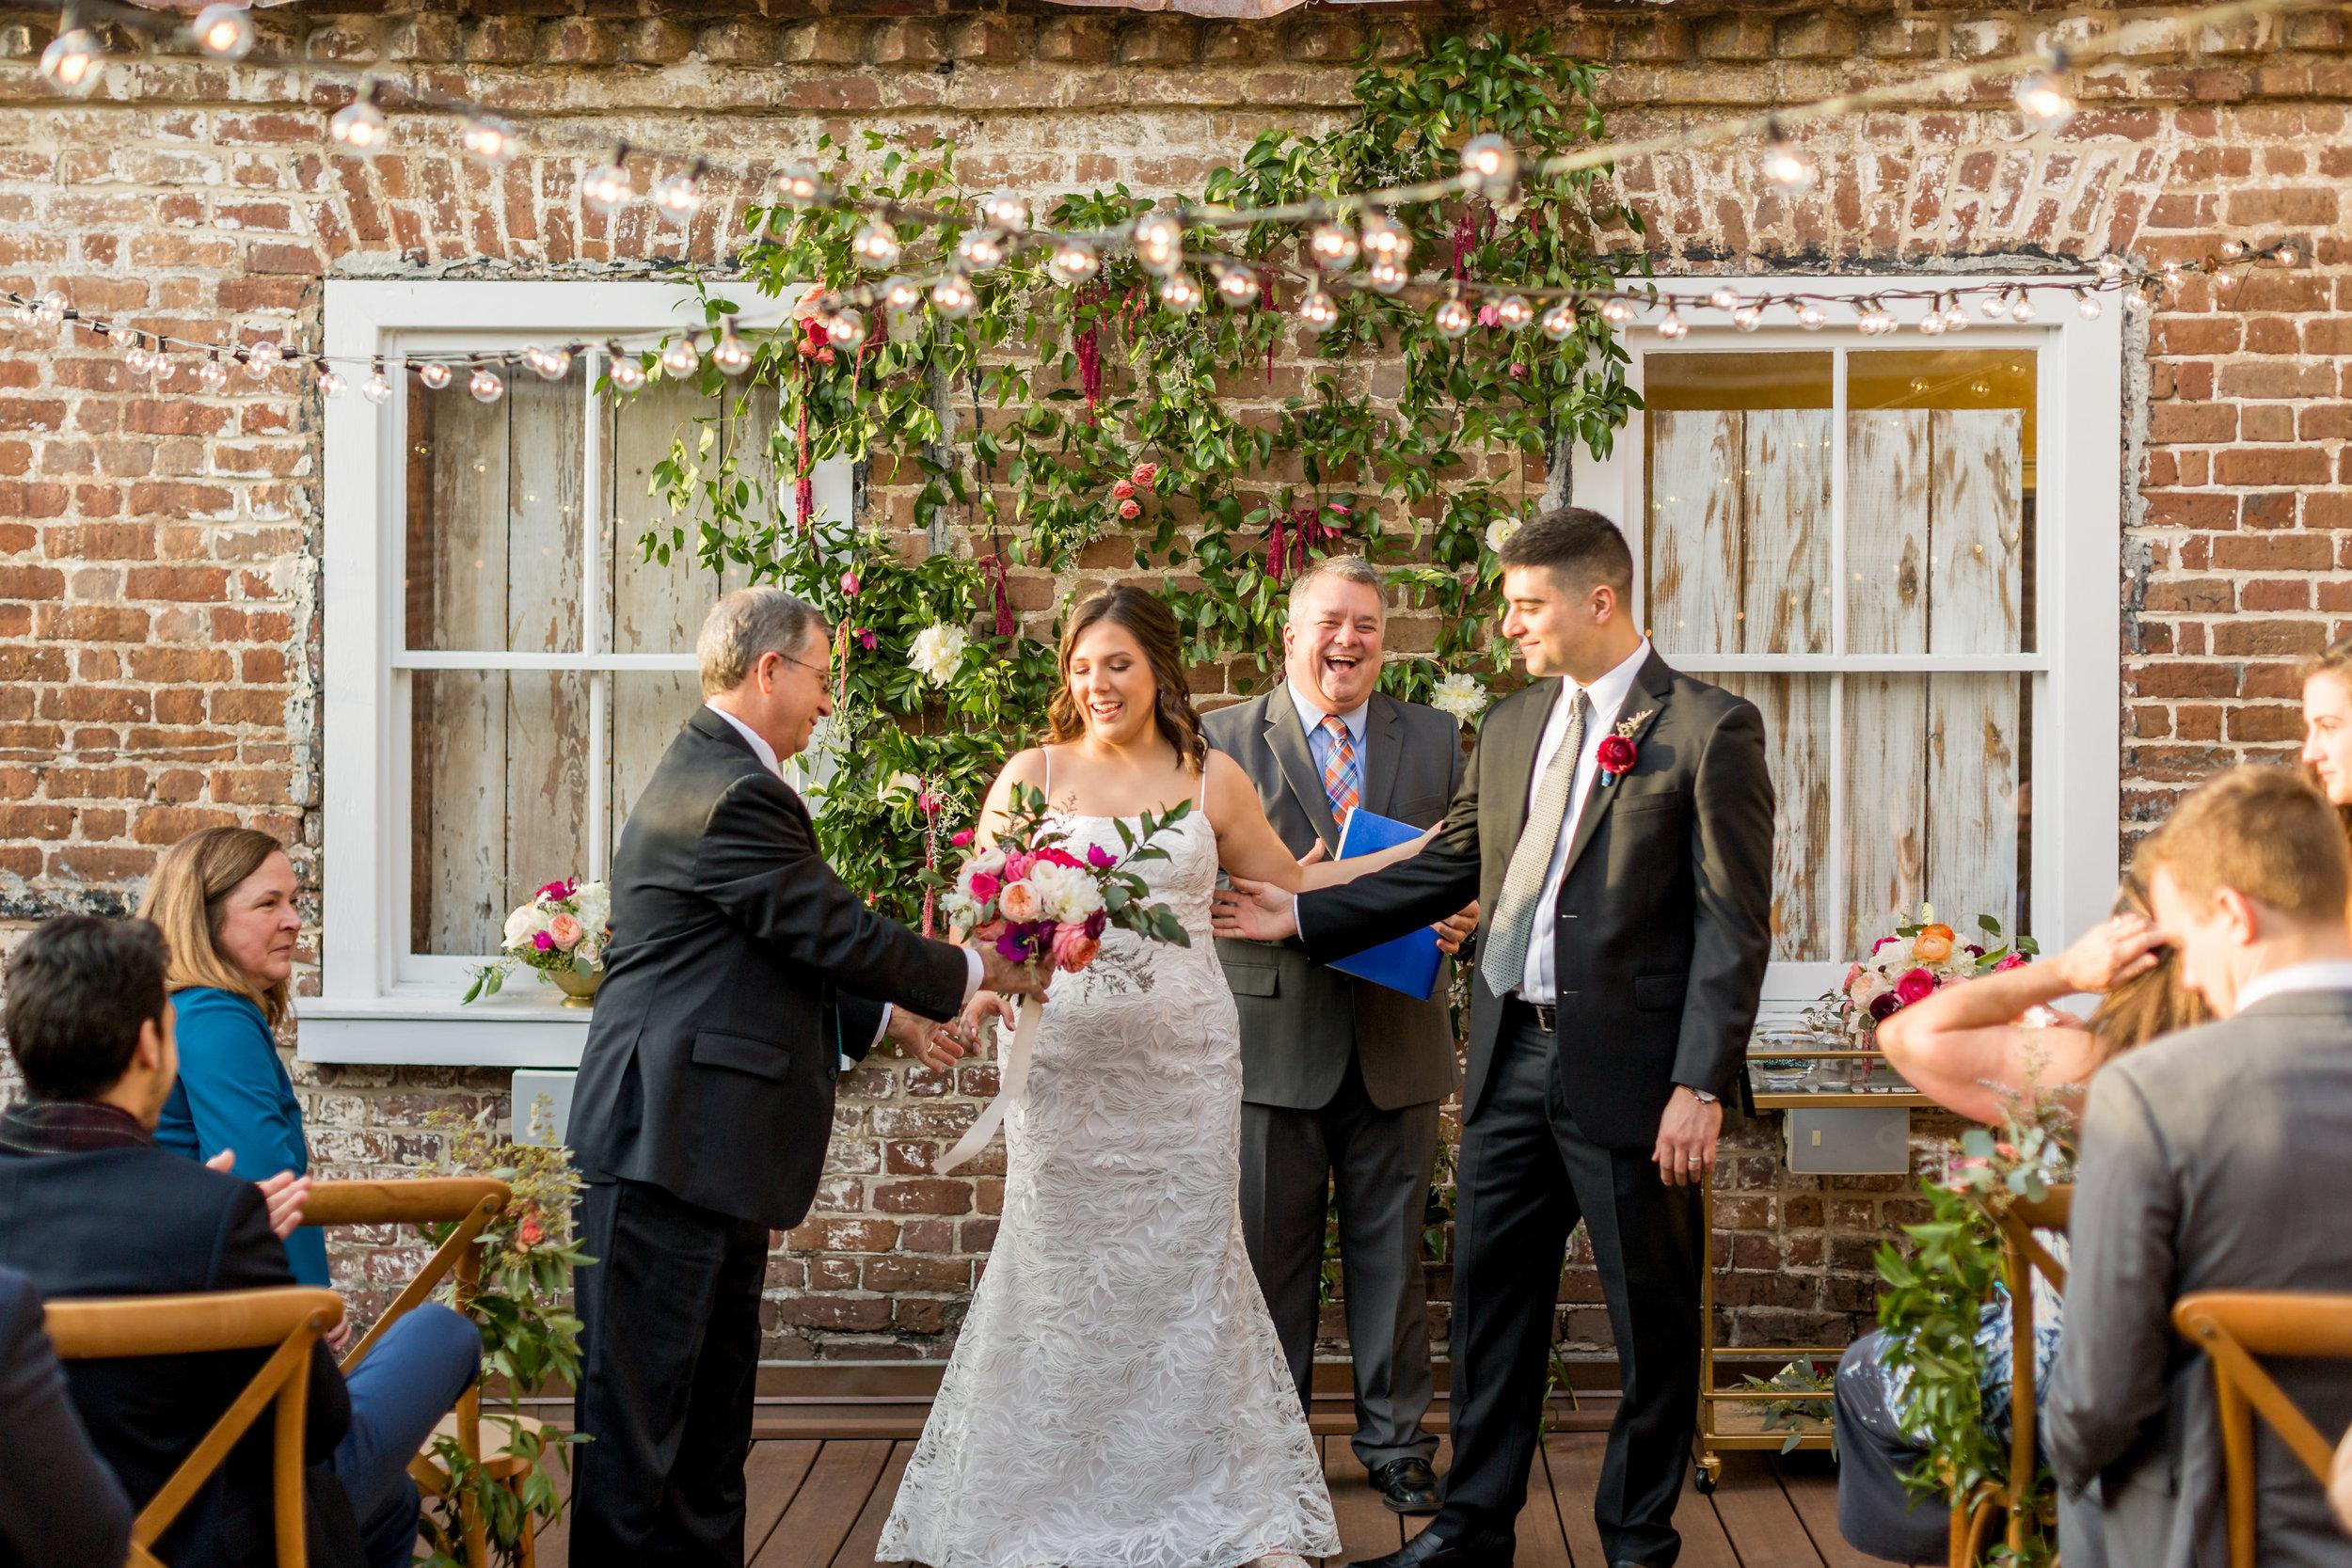 charleston new years elopement popup surprise wedding at upstairs at midtown - scarlet plan & design wedding planners (85).jpg